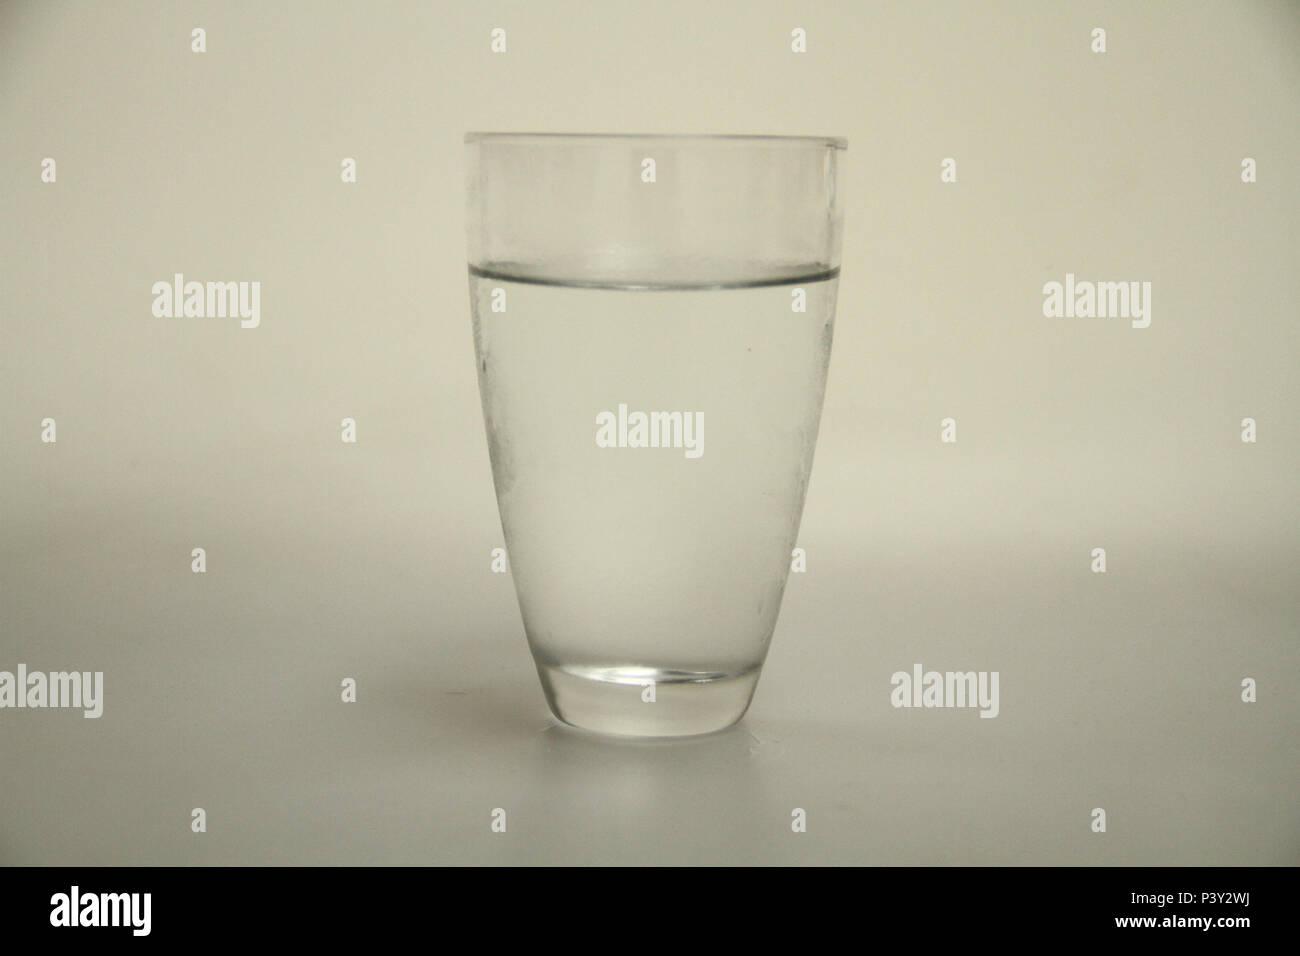 Copo contendo gelo em estado líquido. Imagen De Stock